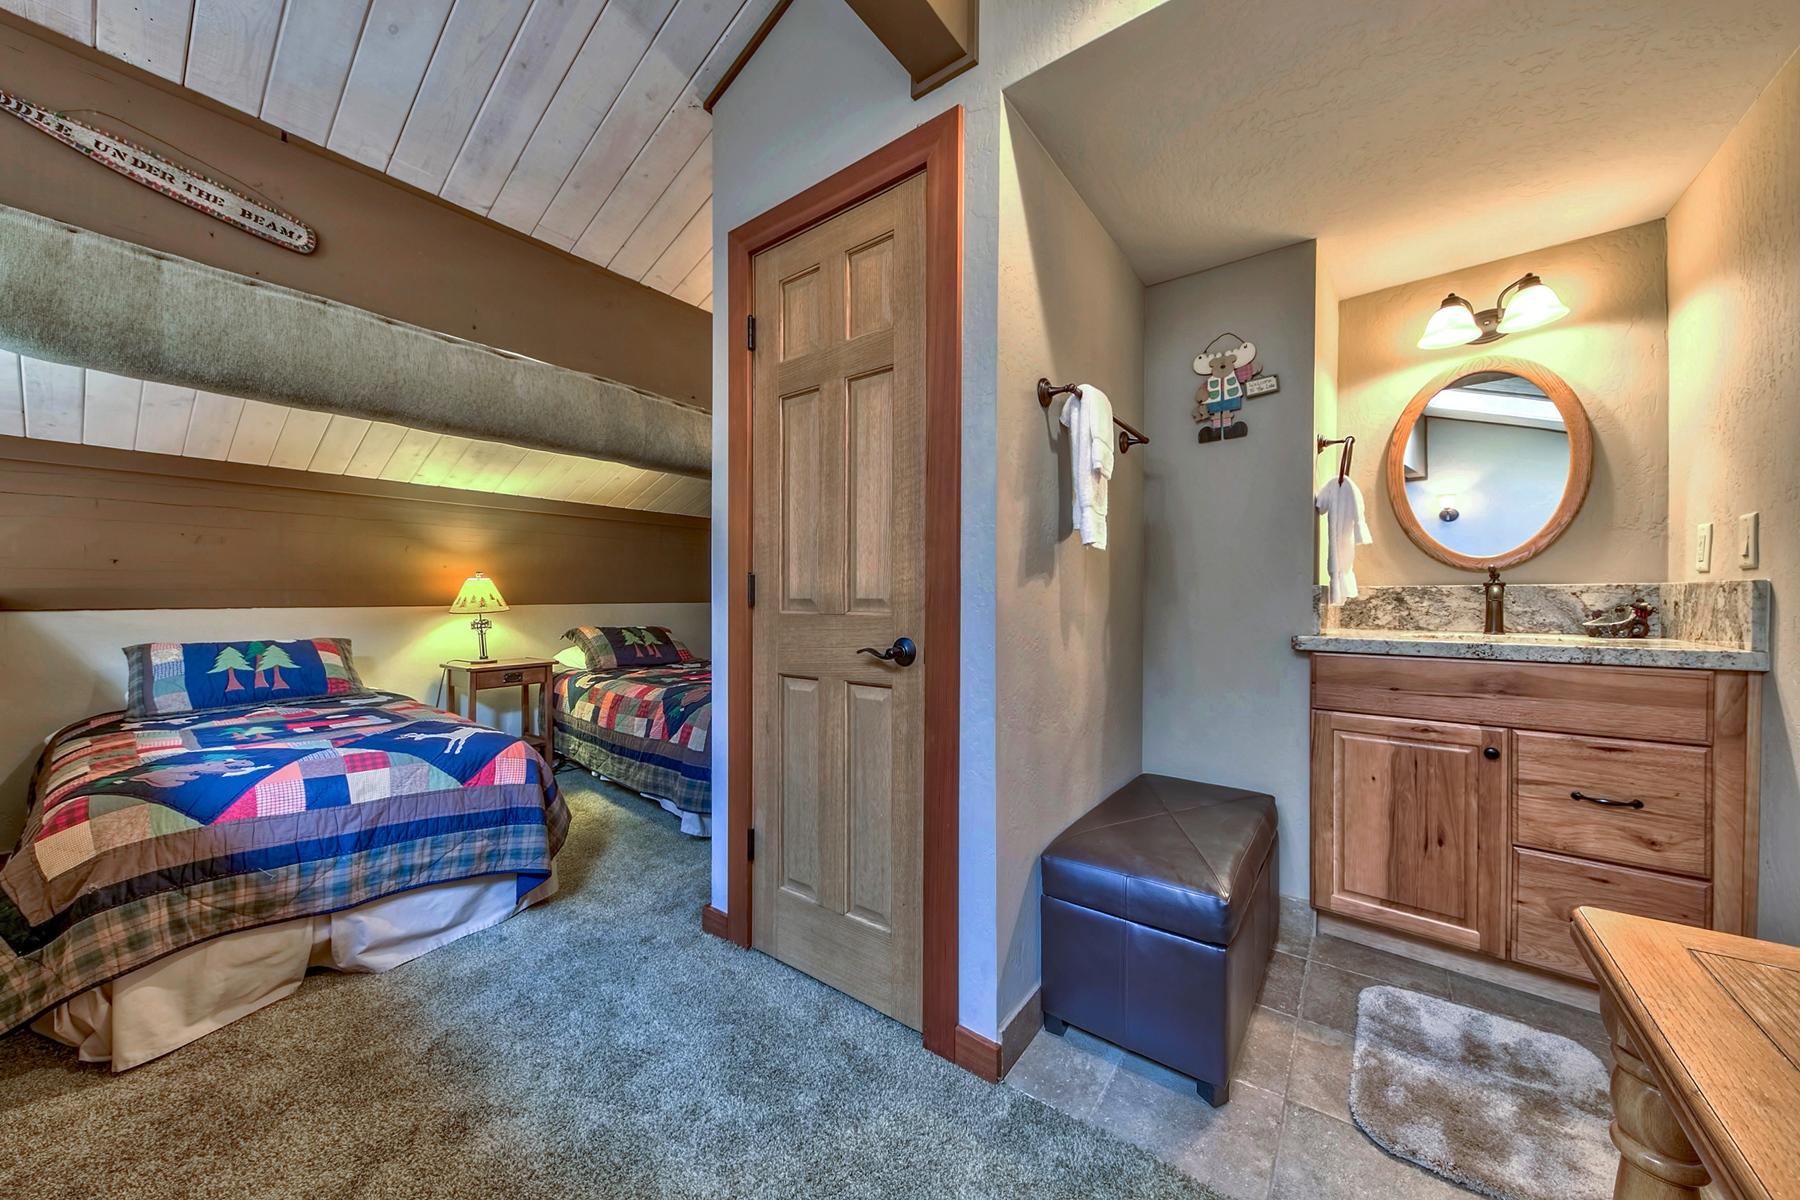 Additional photo for property listing at 9200 Brockway Springs Drive #22, Kings Beach, CA 9200 Brockway Springs Drive #22 Kings Beach, California 96143 United States